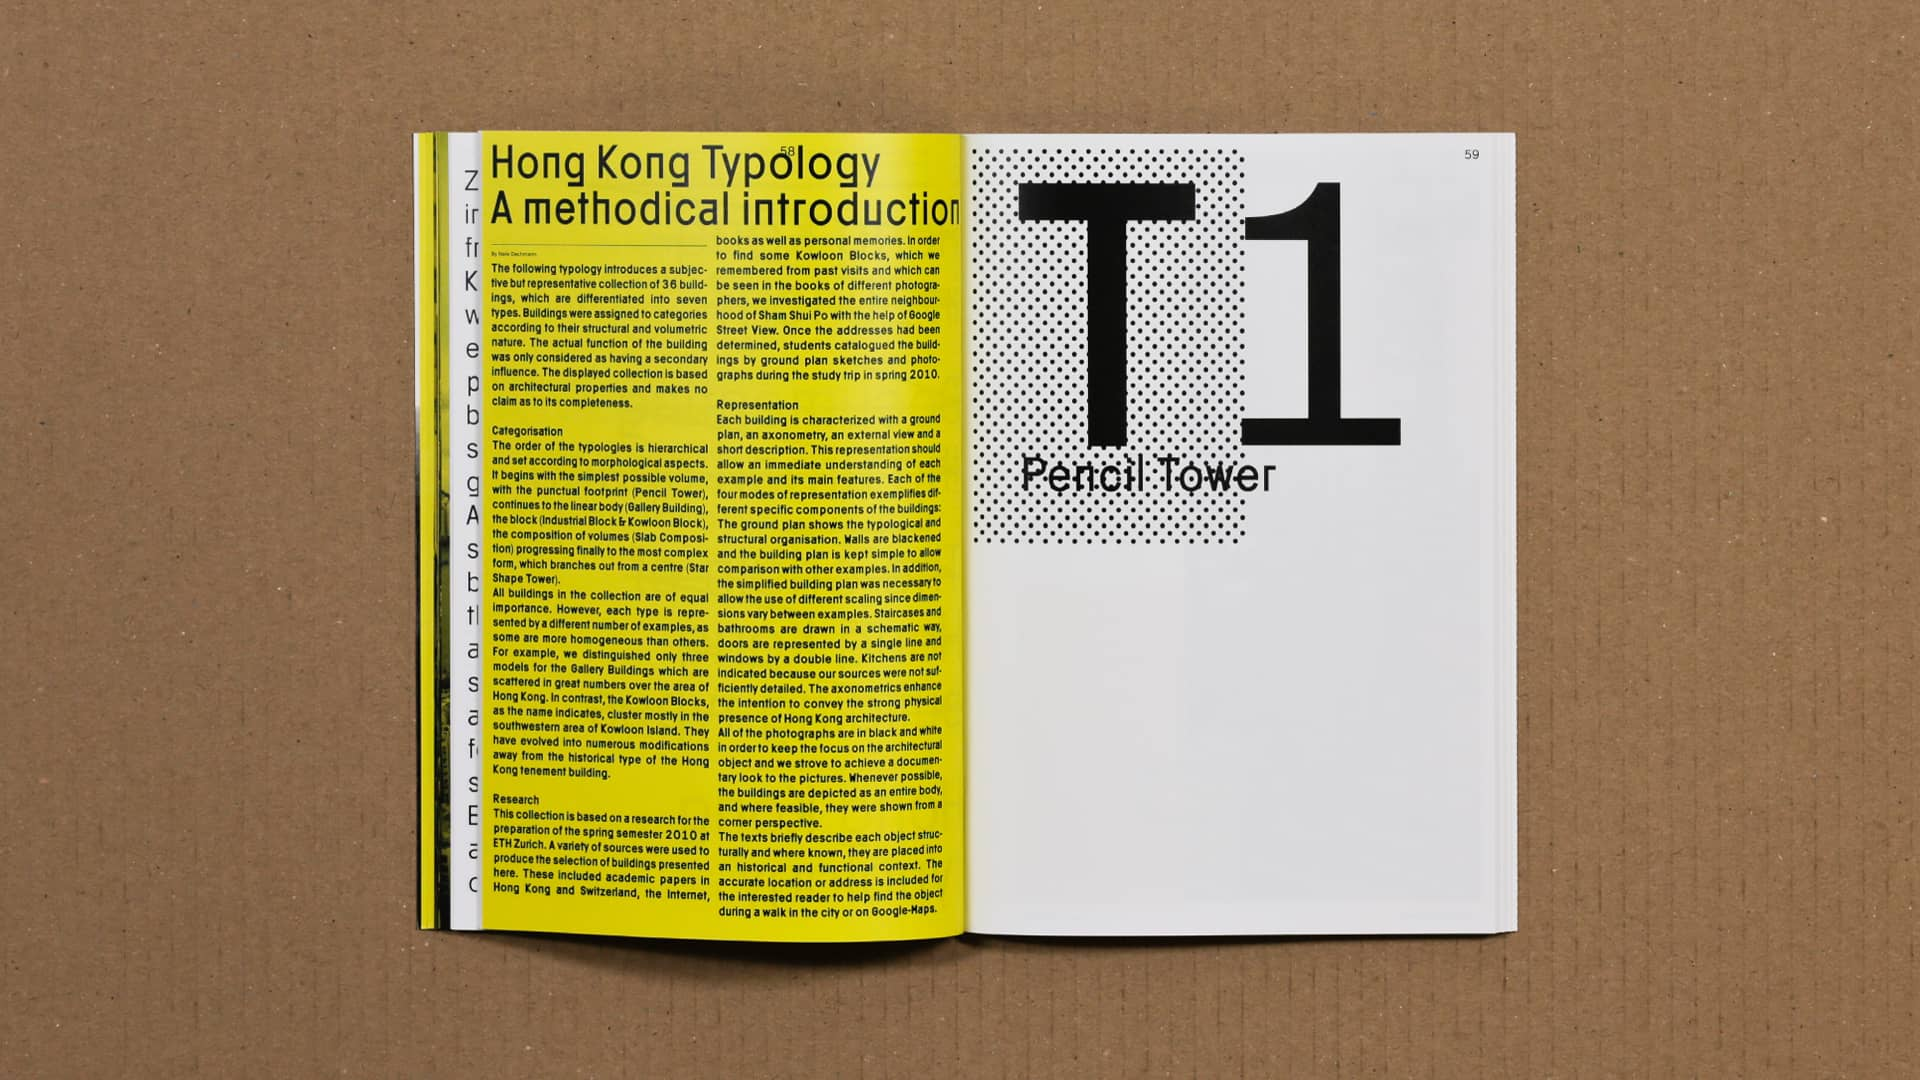 Hong Kong Typology An Architectural Research On Hong Kong Building Types Index Christ Gantenbein